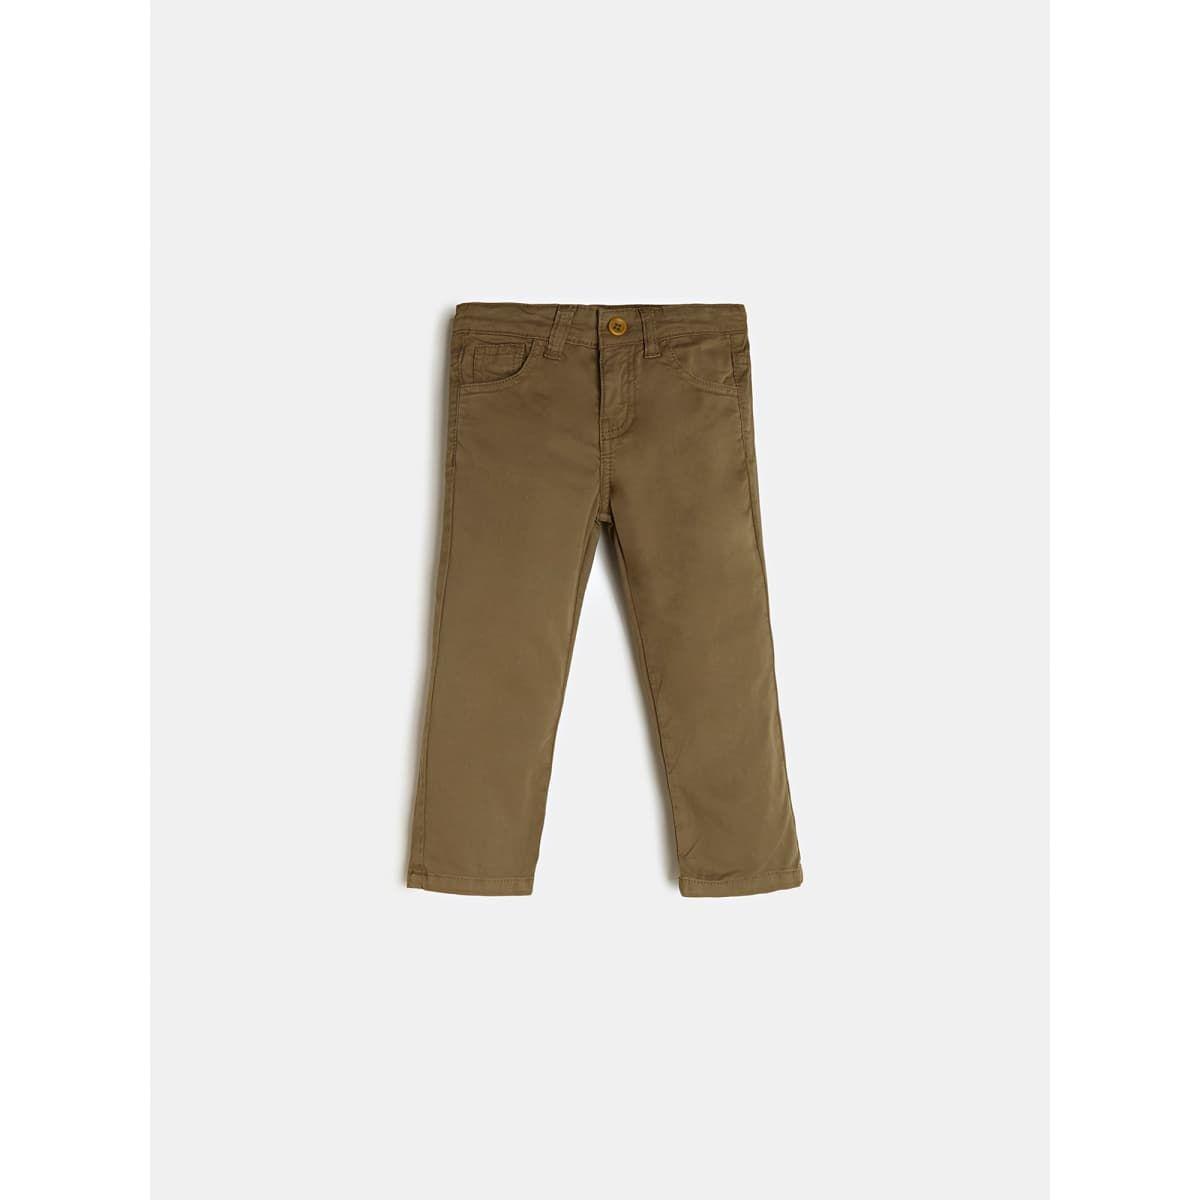 Pantalon Coupe Skinny Teinture Pièce